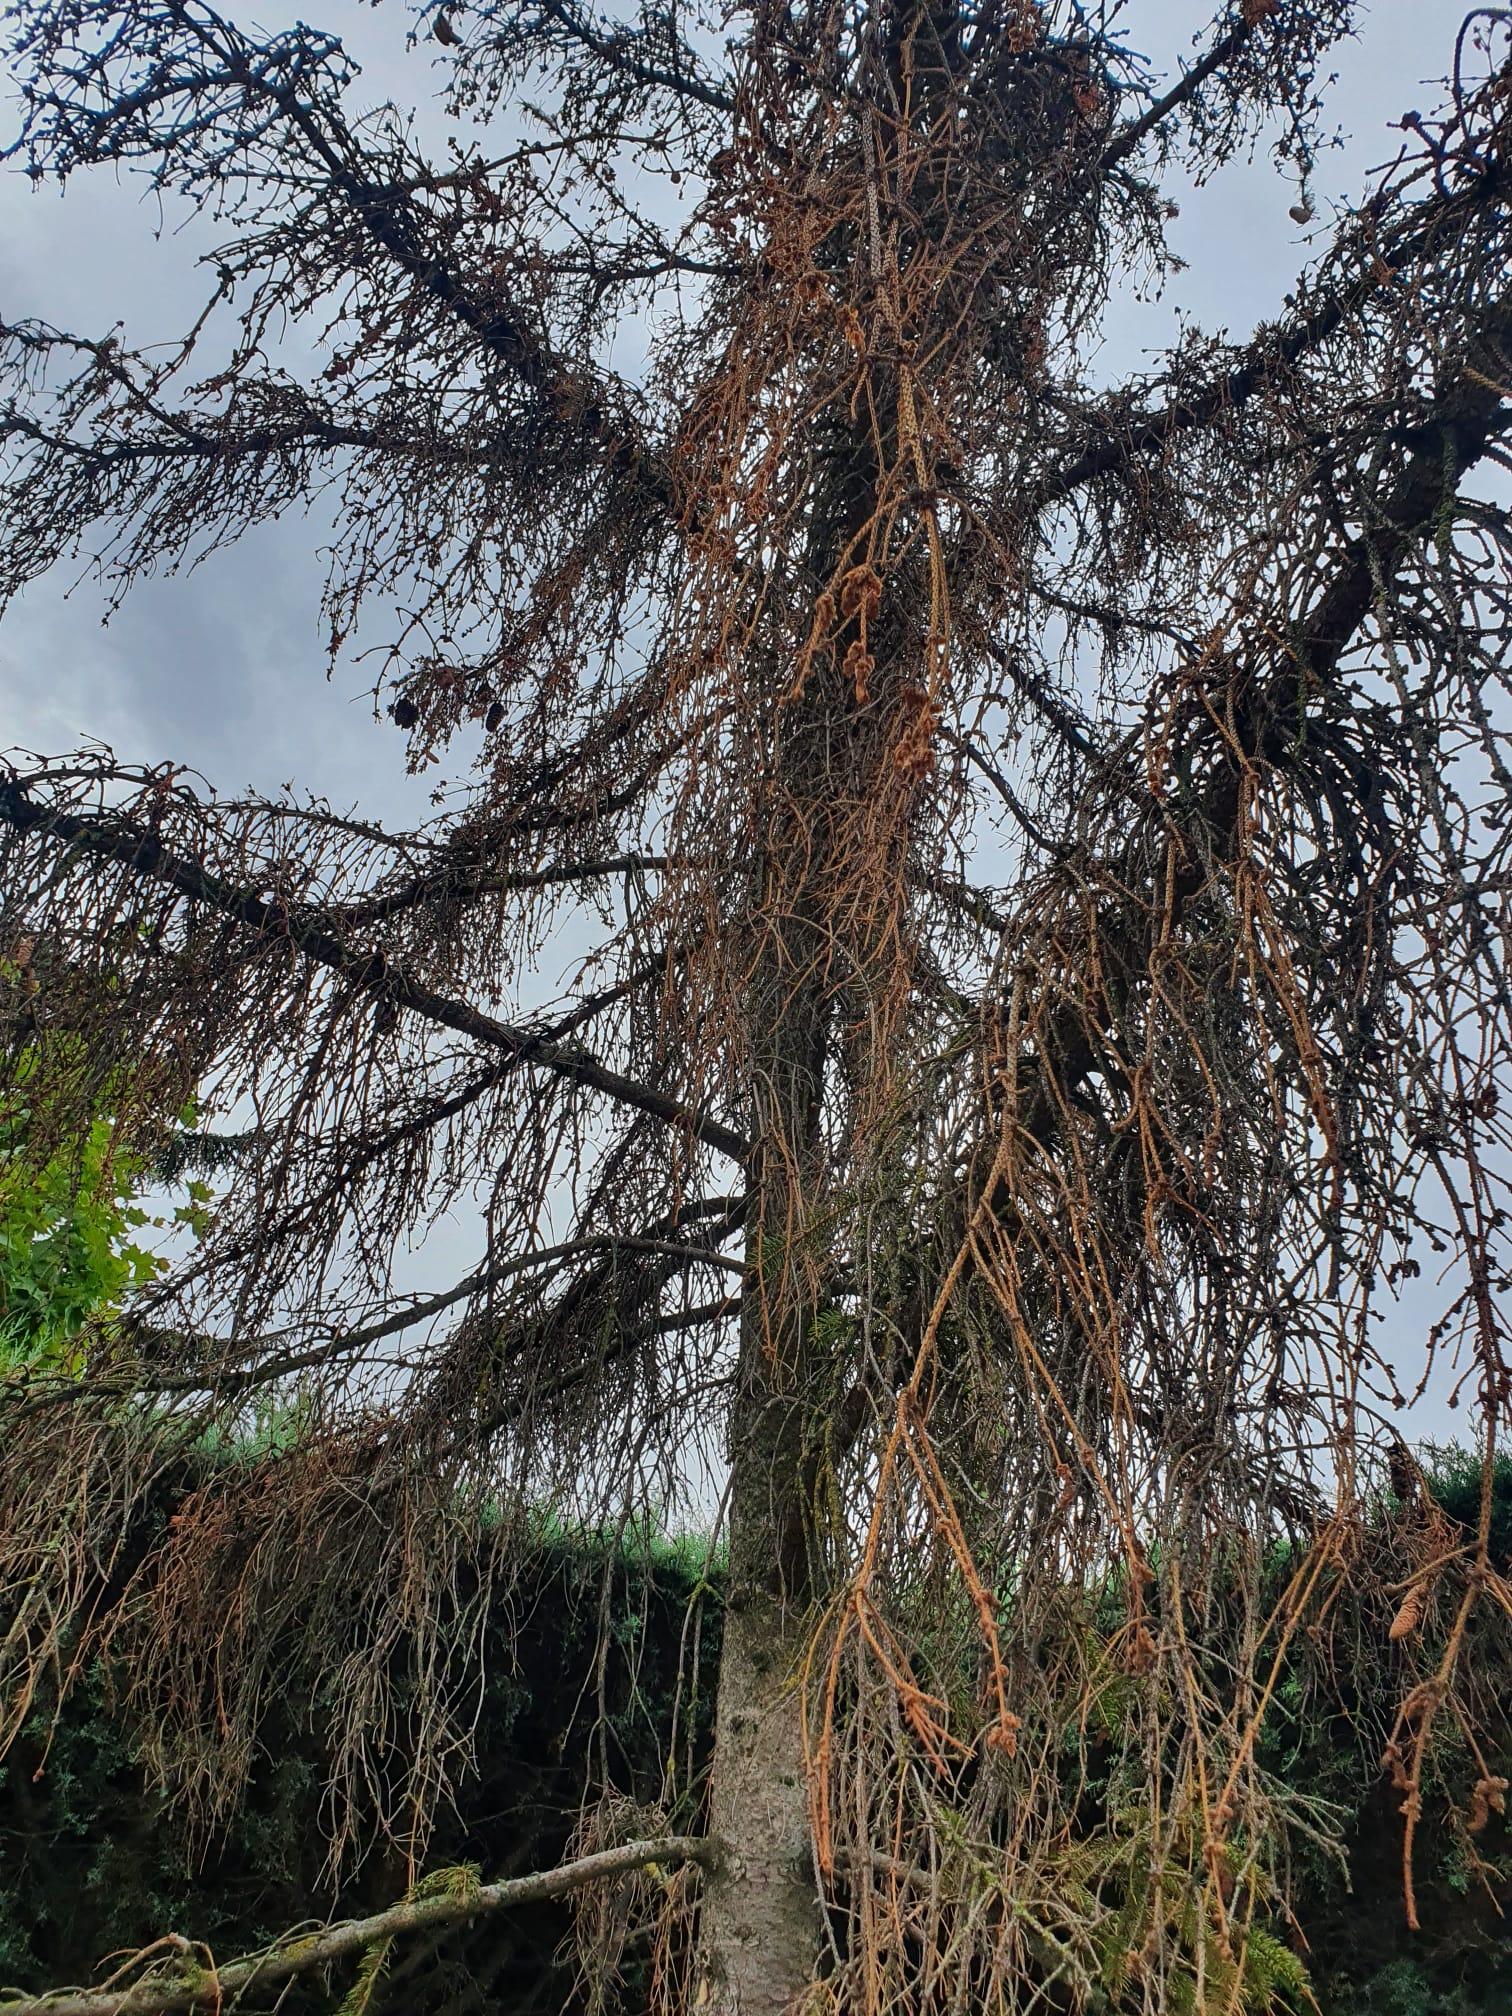 Arbol seco, la importancia de cuidar la vegetacion